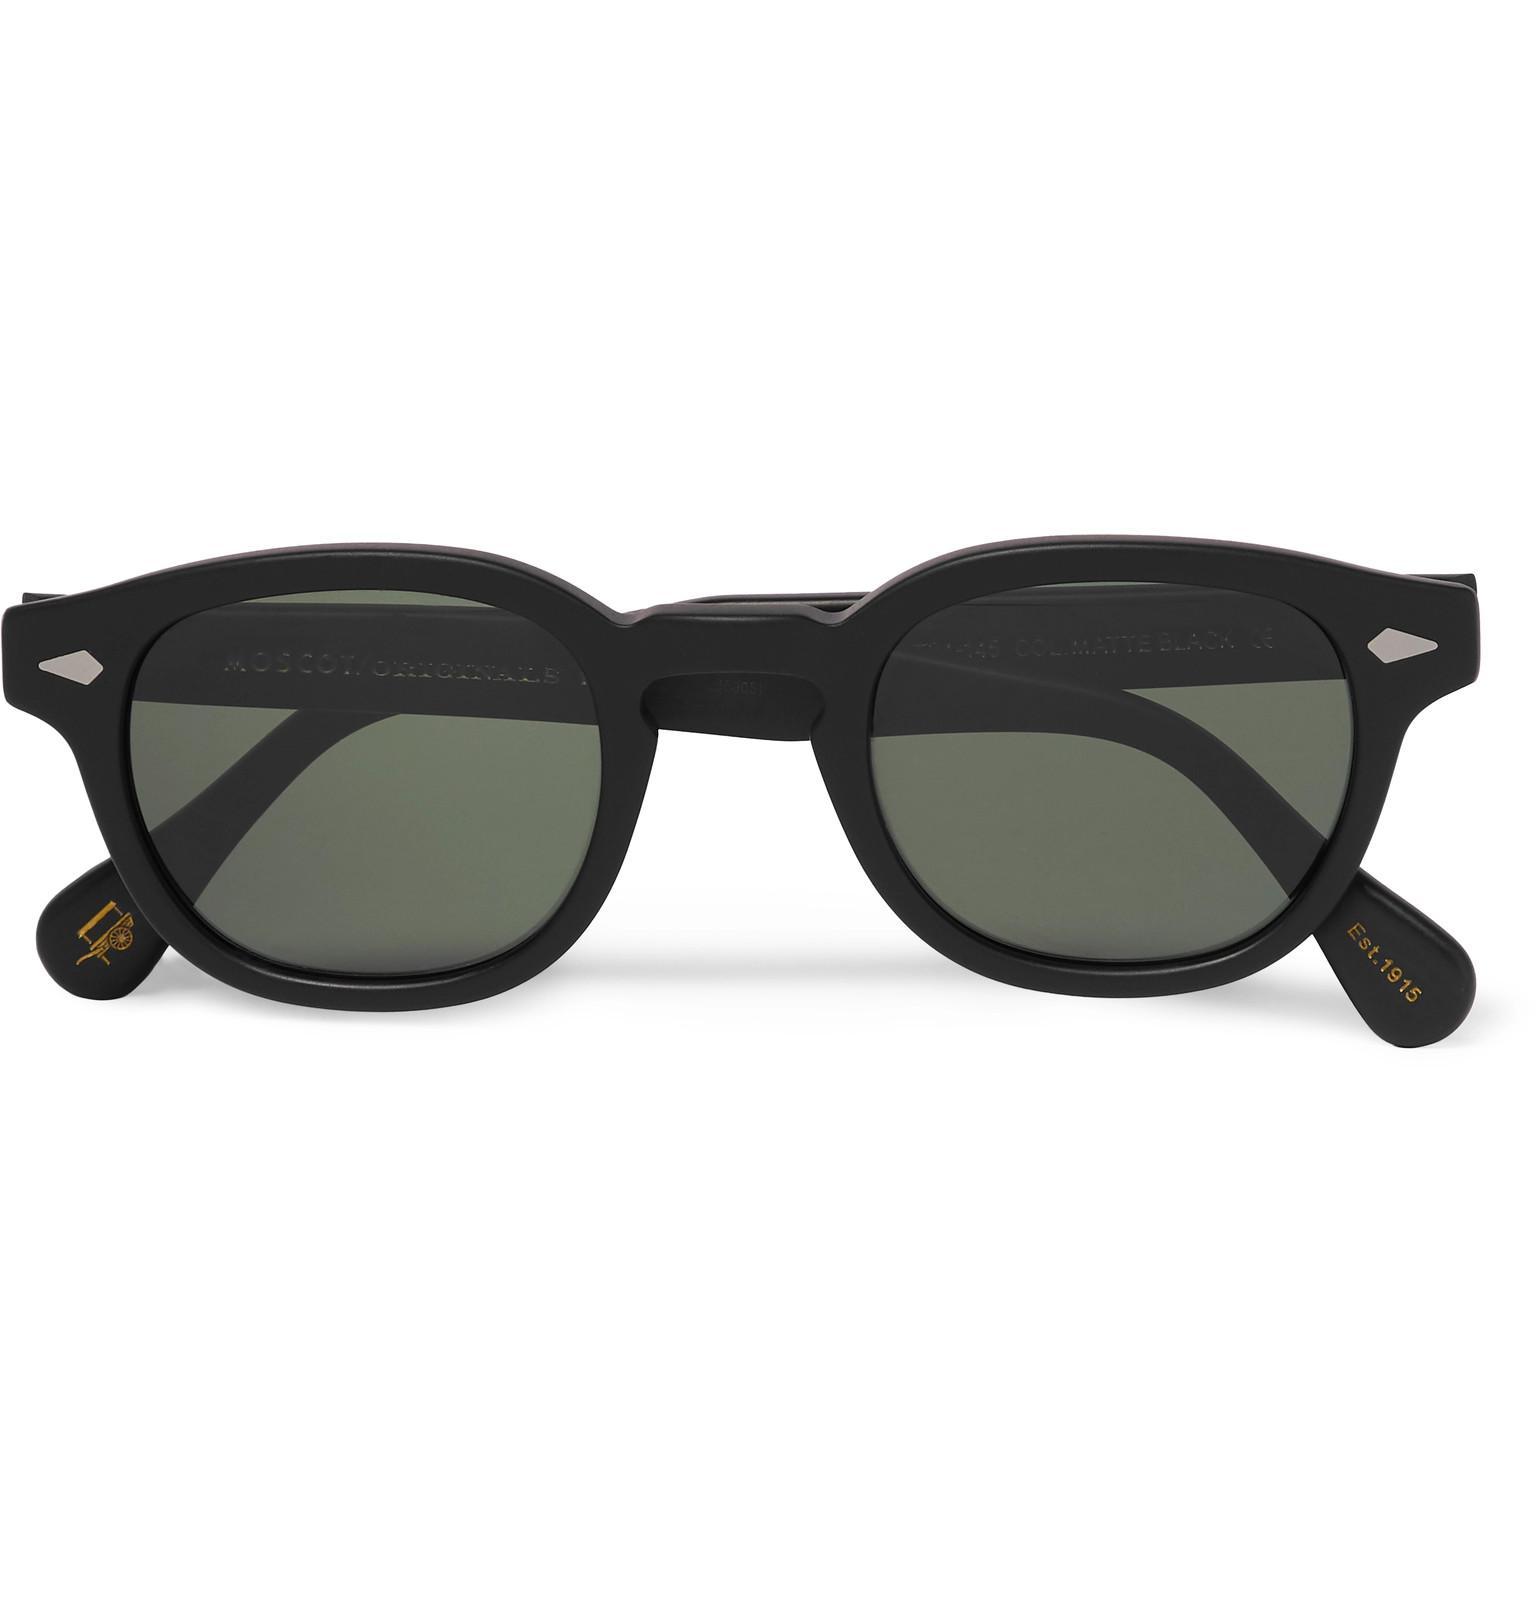 6be126601cef Moscot Lemtosh Round-frame Matte-acetate Sunglasses in Black for Men ...